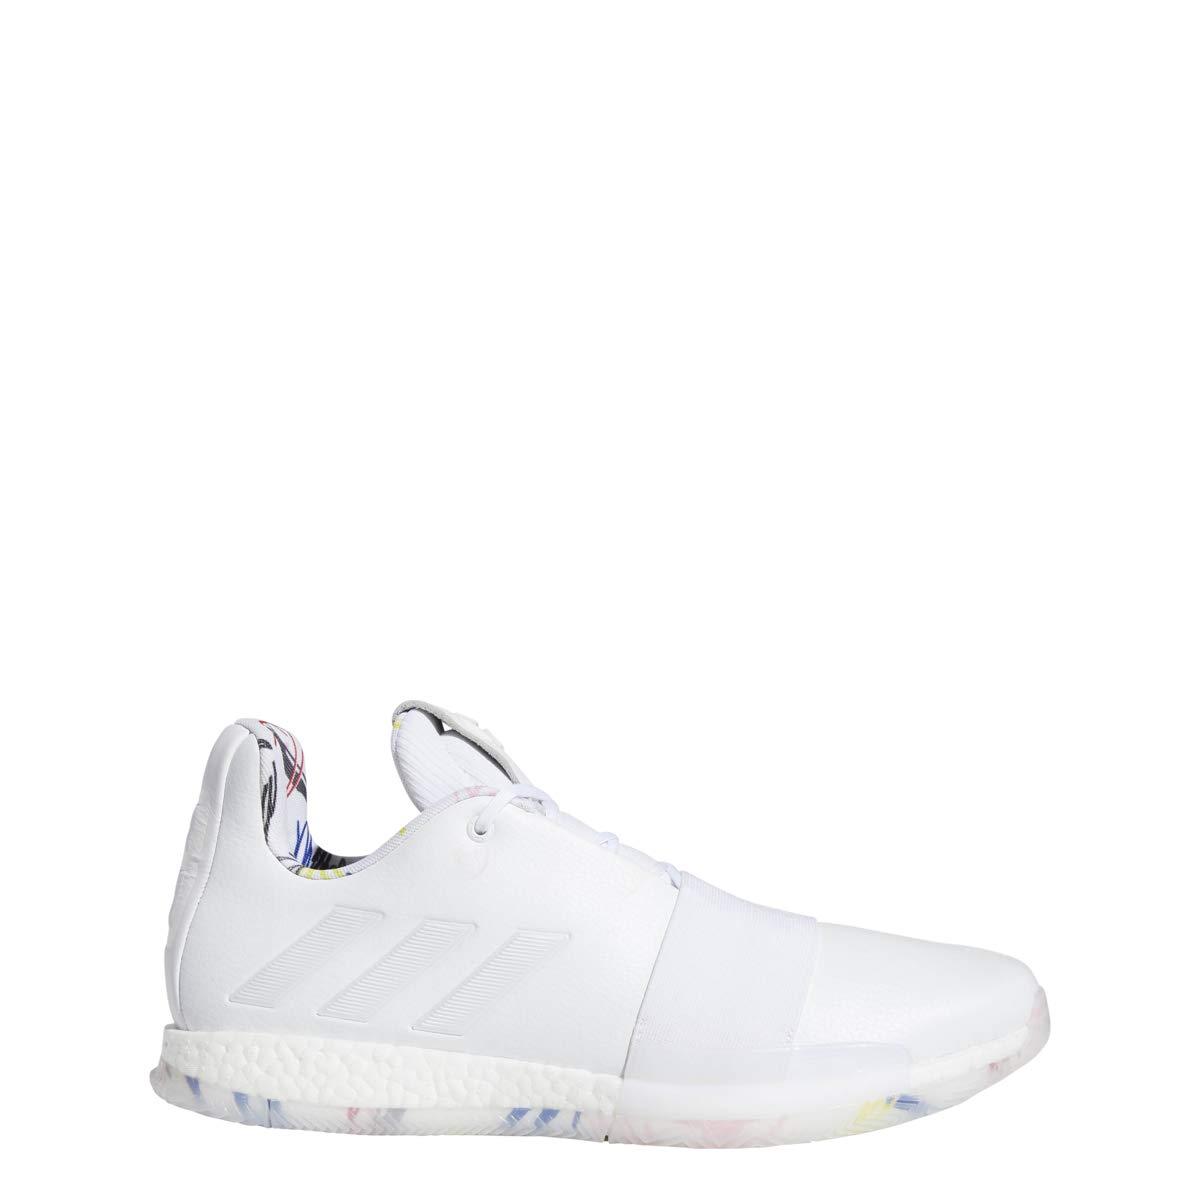 big sale 0828d 1867b Amazon.com   adidas Men s Harden Vol. 3 Basketball Shoes   Basketball